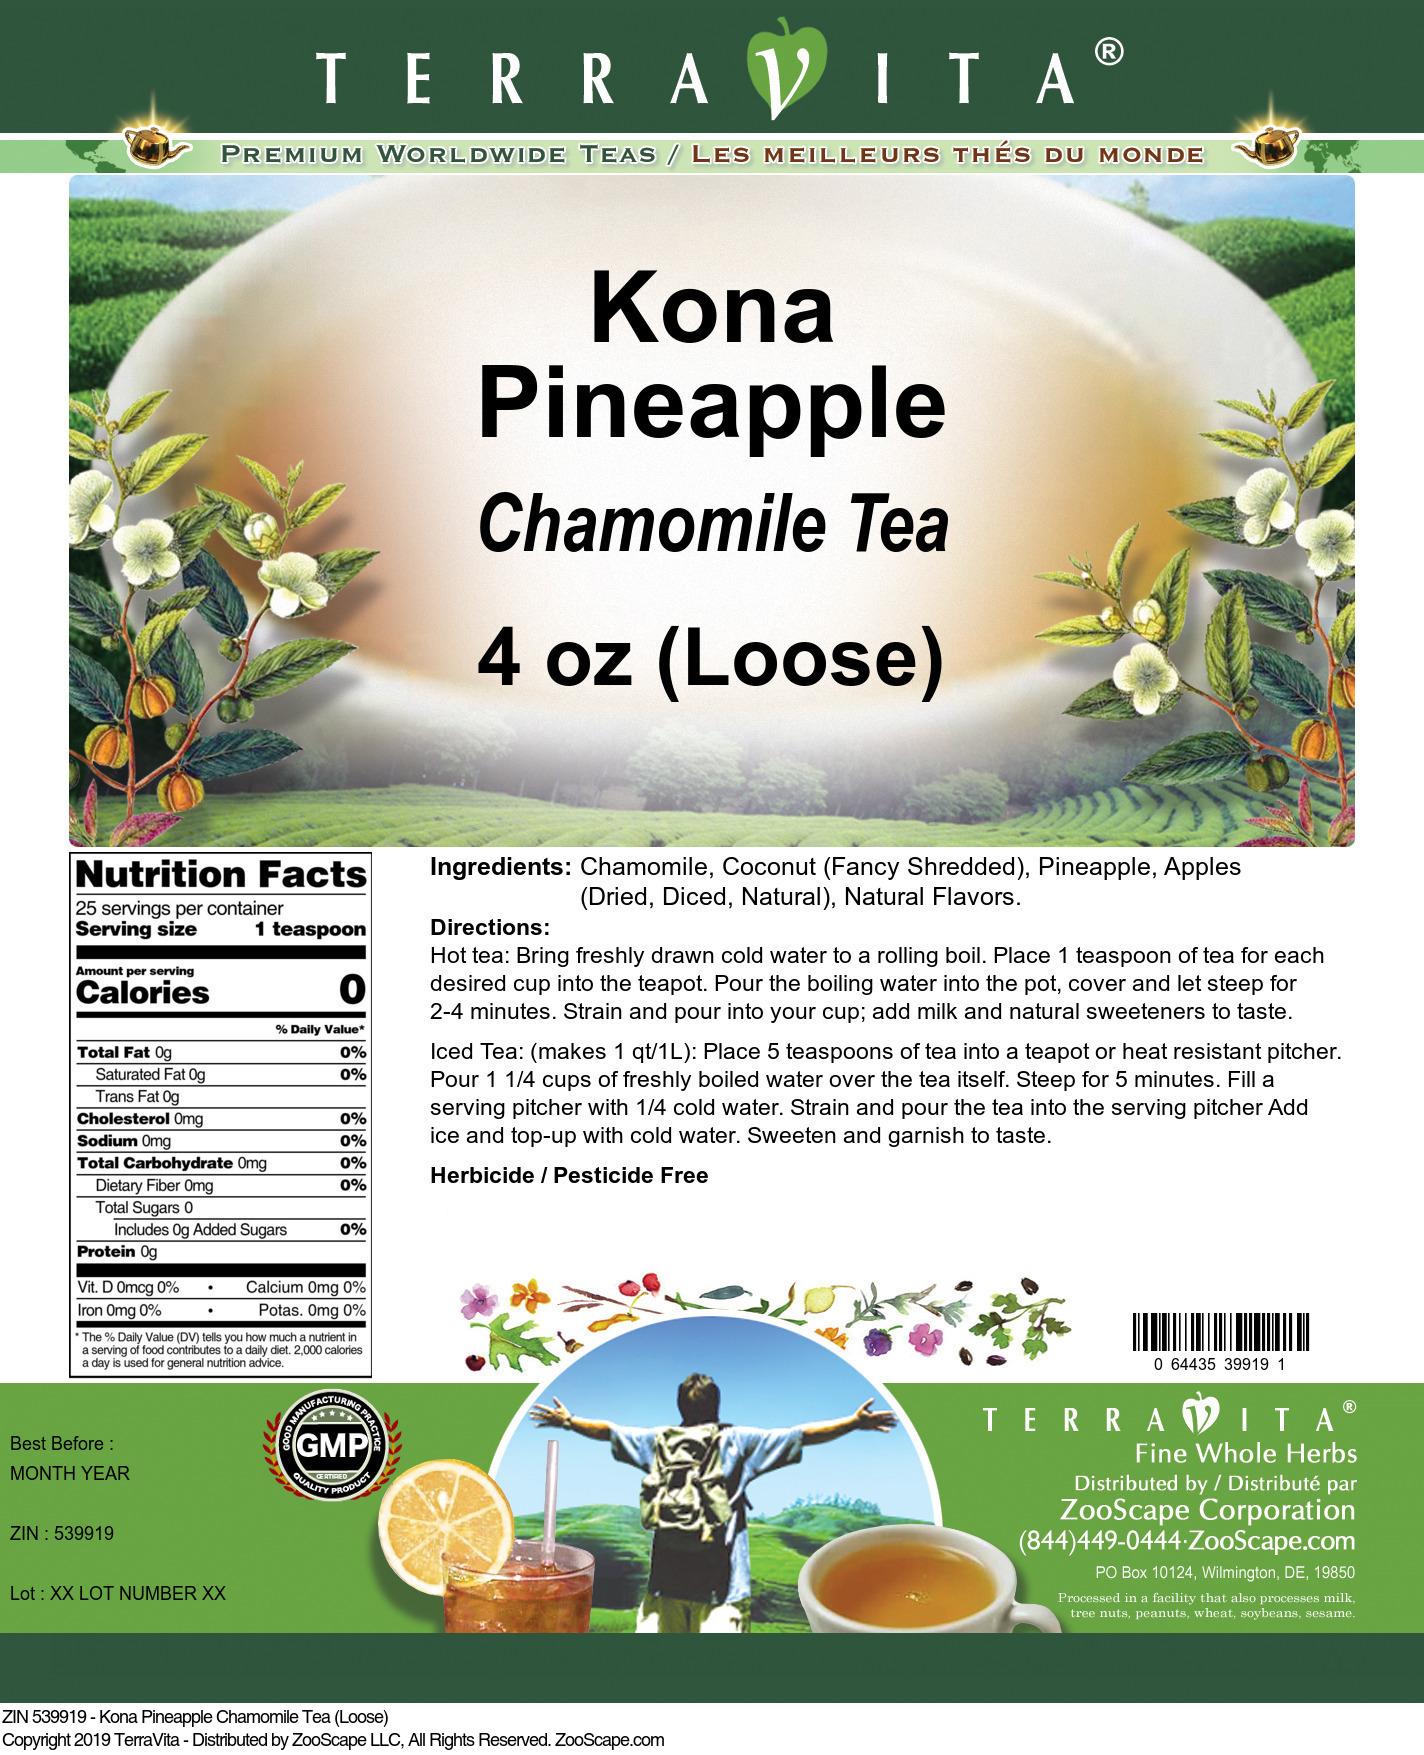 Kona Pineapple Chamomile Tea